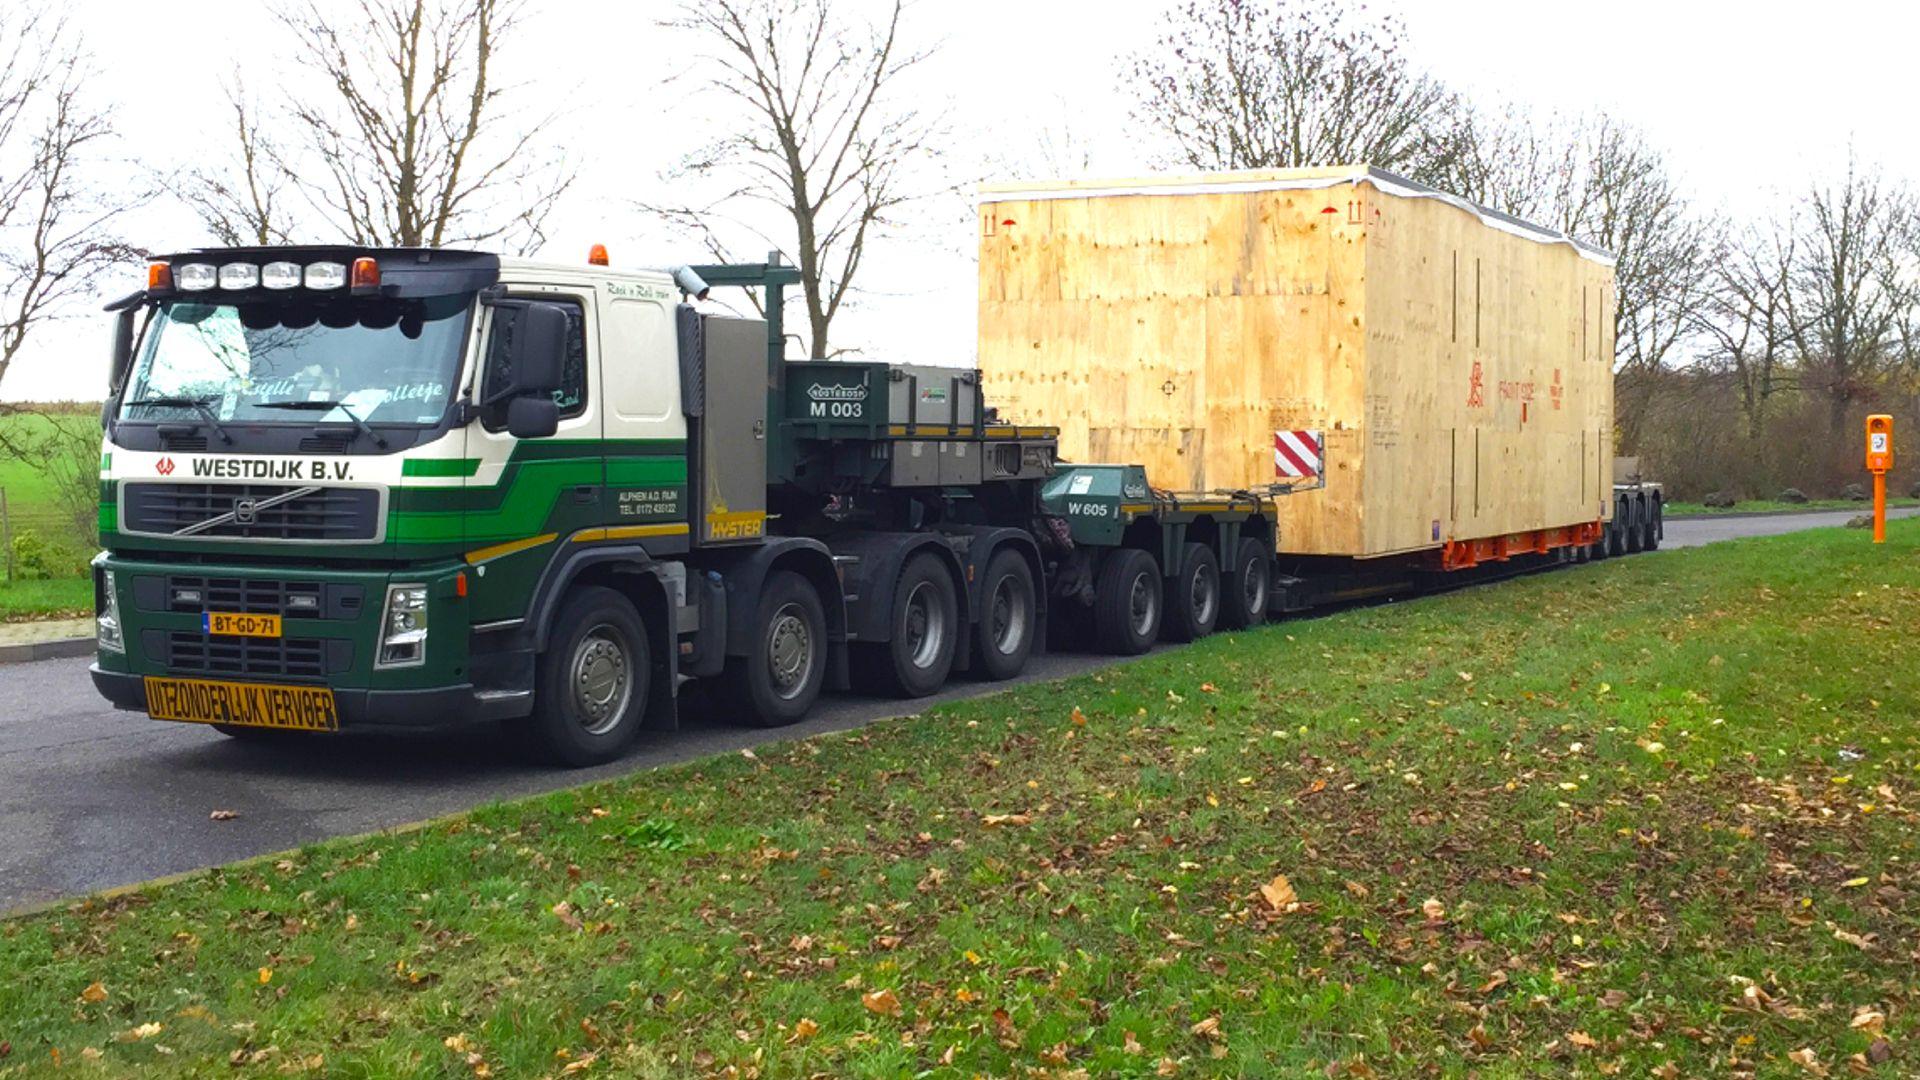 Permalink to: Transport Begeleiding Venlo 2